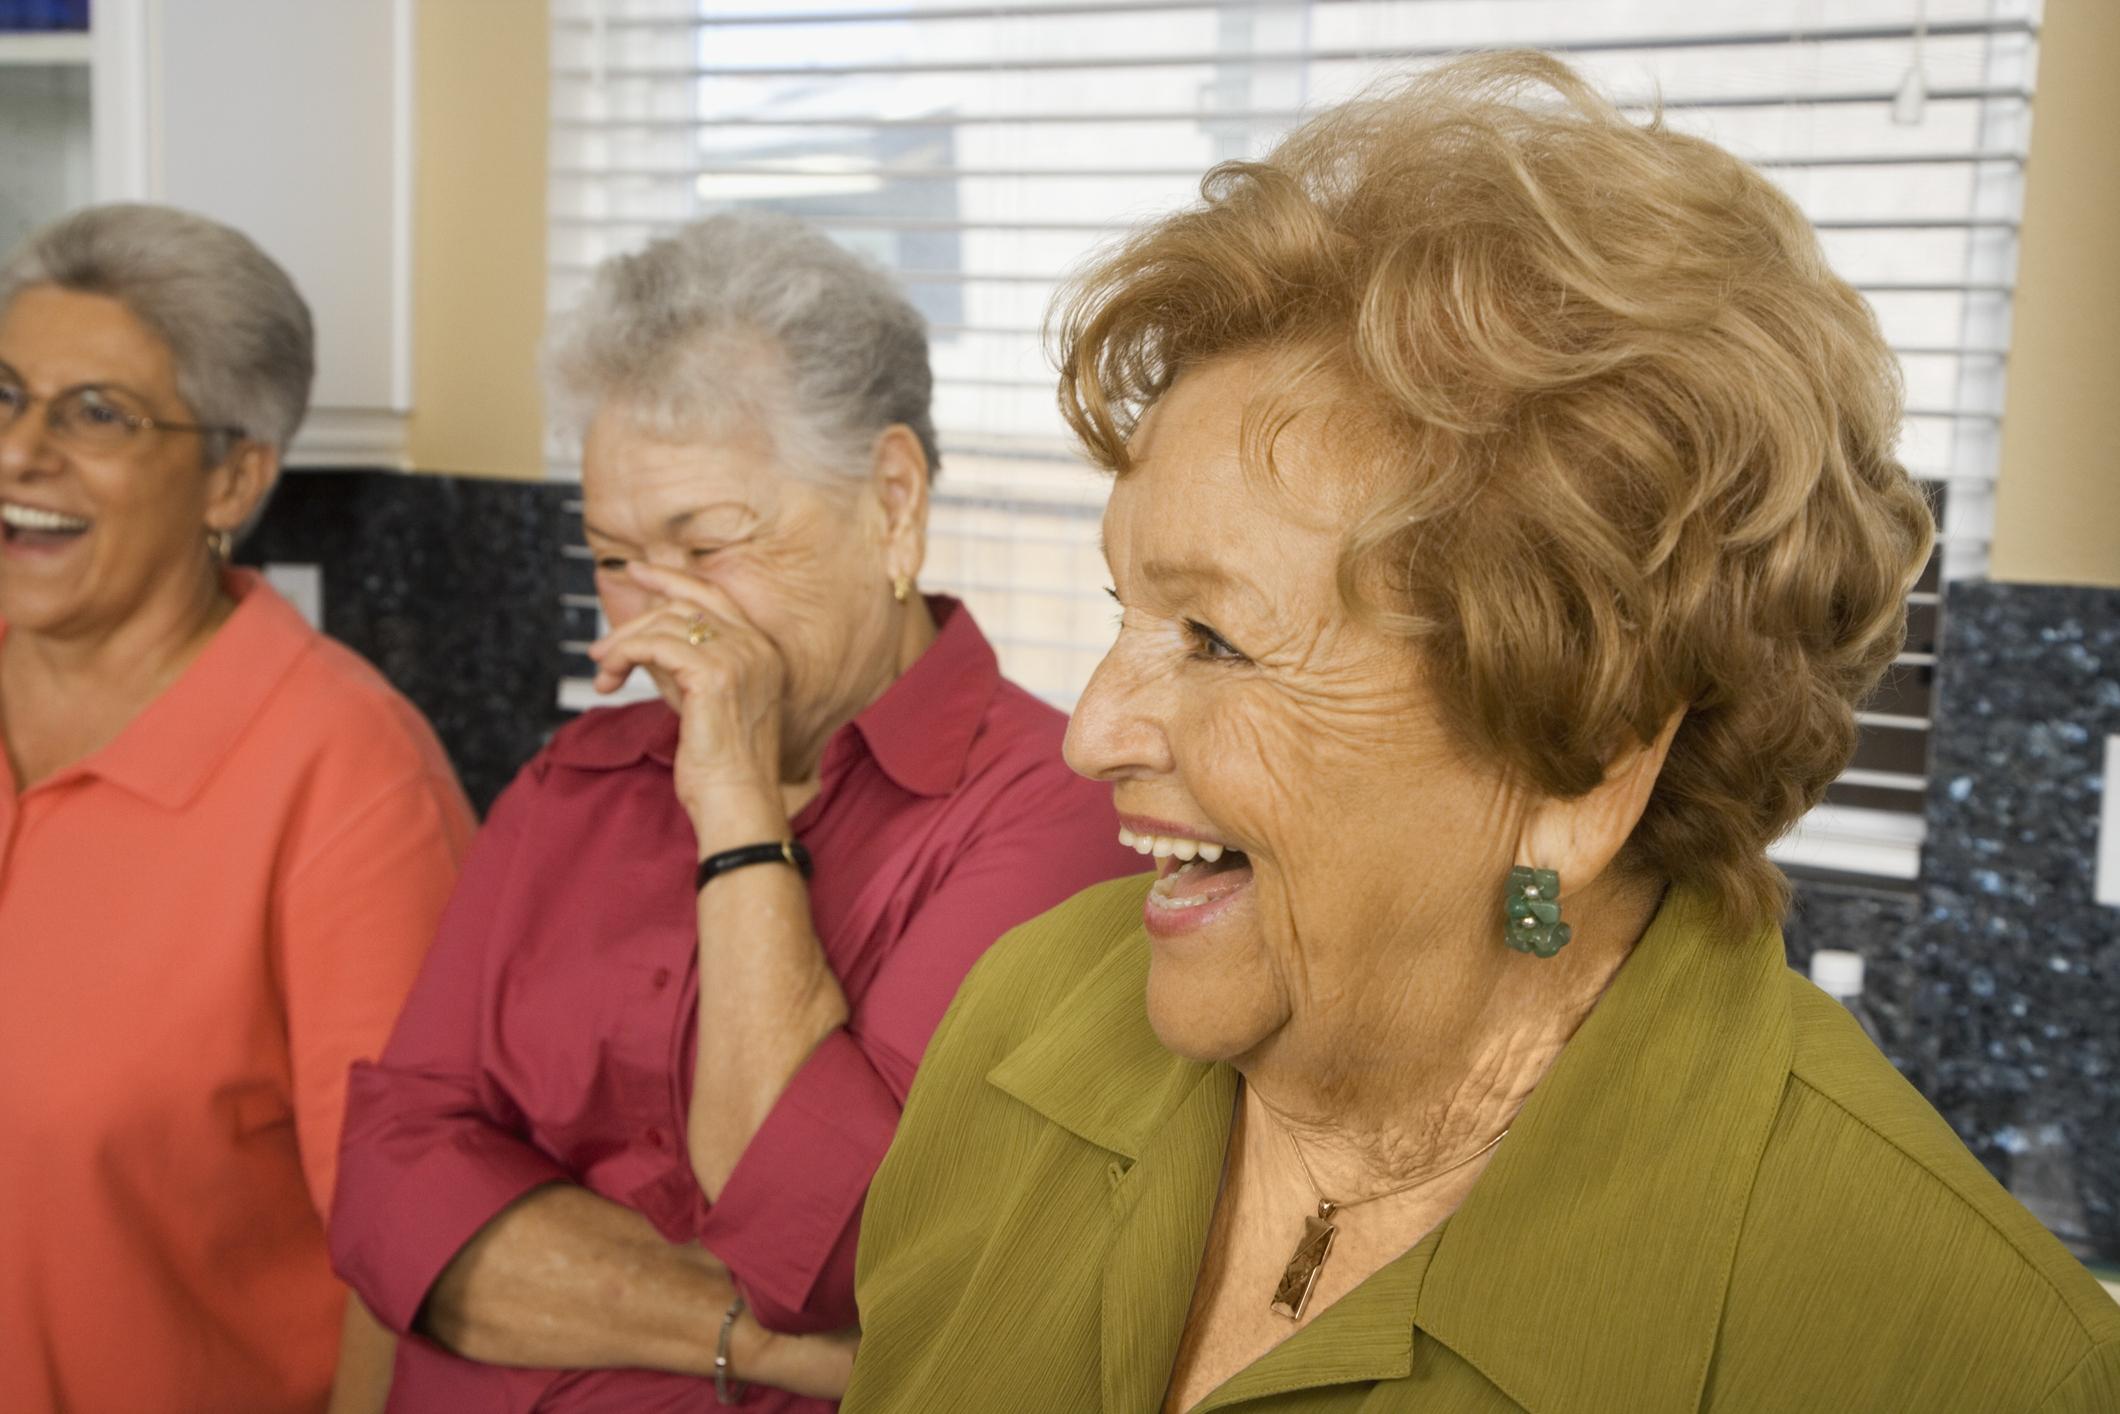 Mujeres-mayores-divirtiendose.jpg